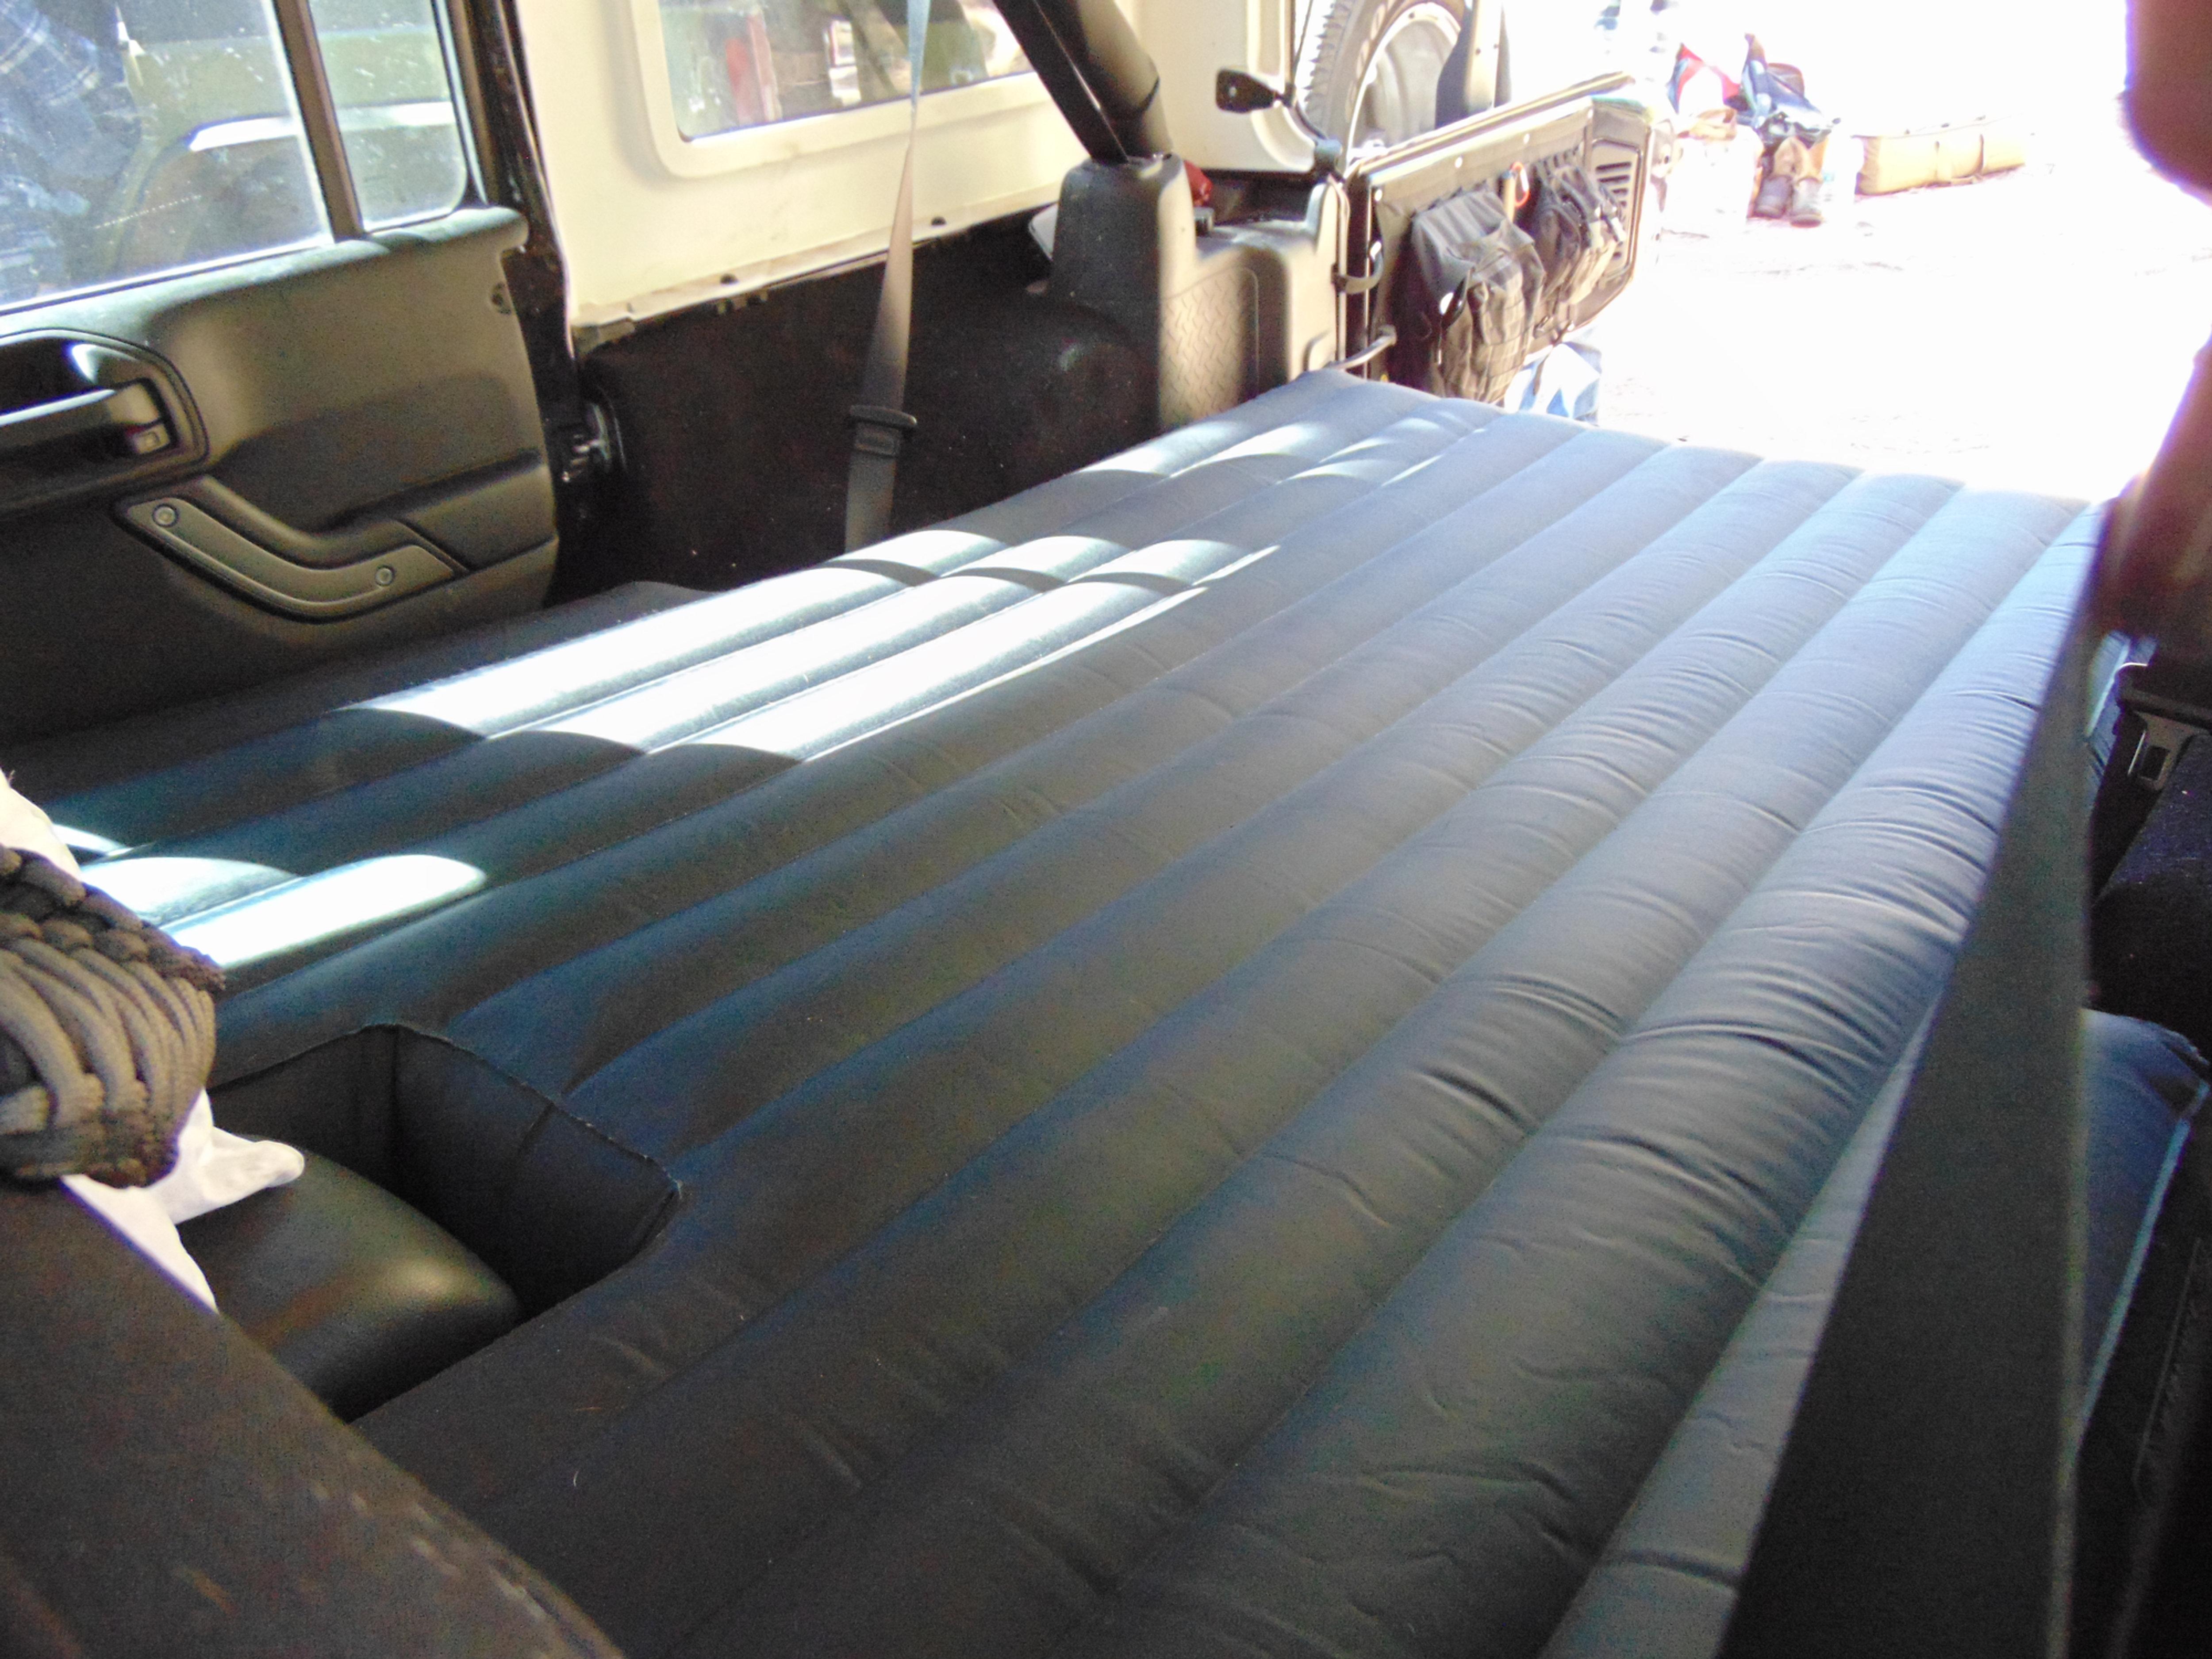 Jeep Wrangler Suv Deepsleep Air Mattress Deepsleep